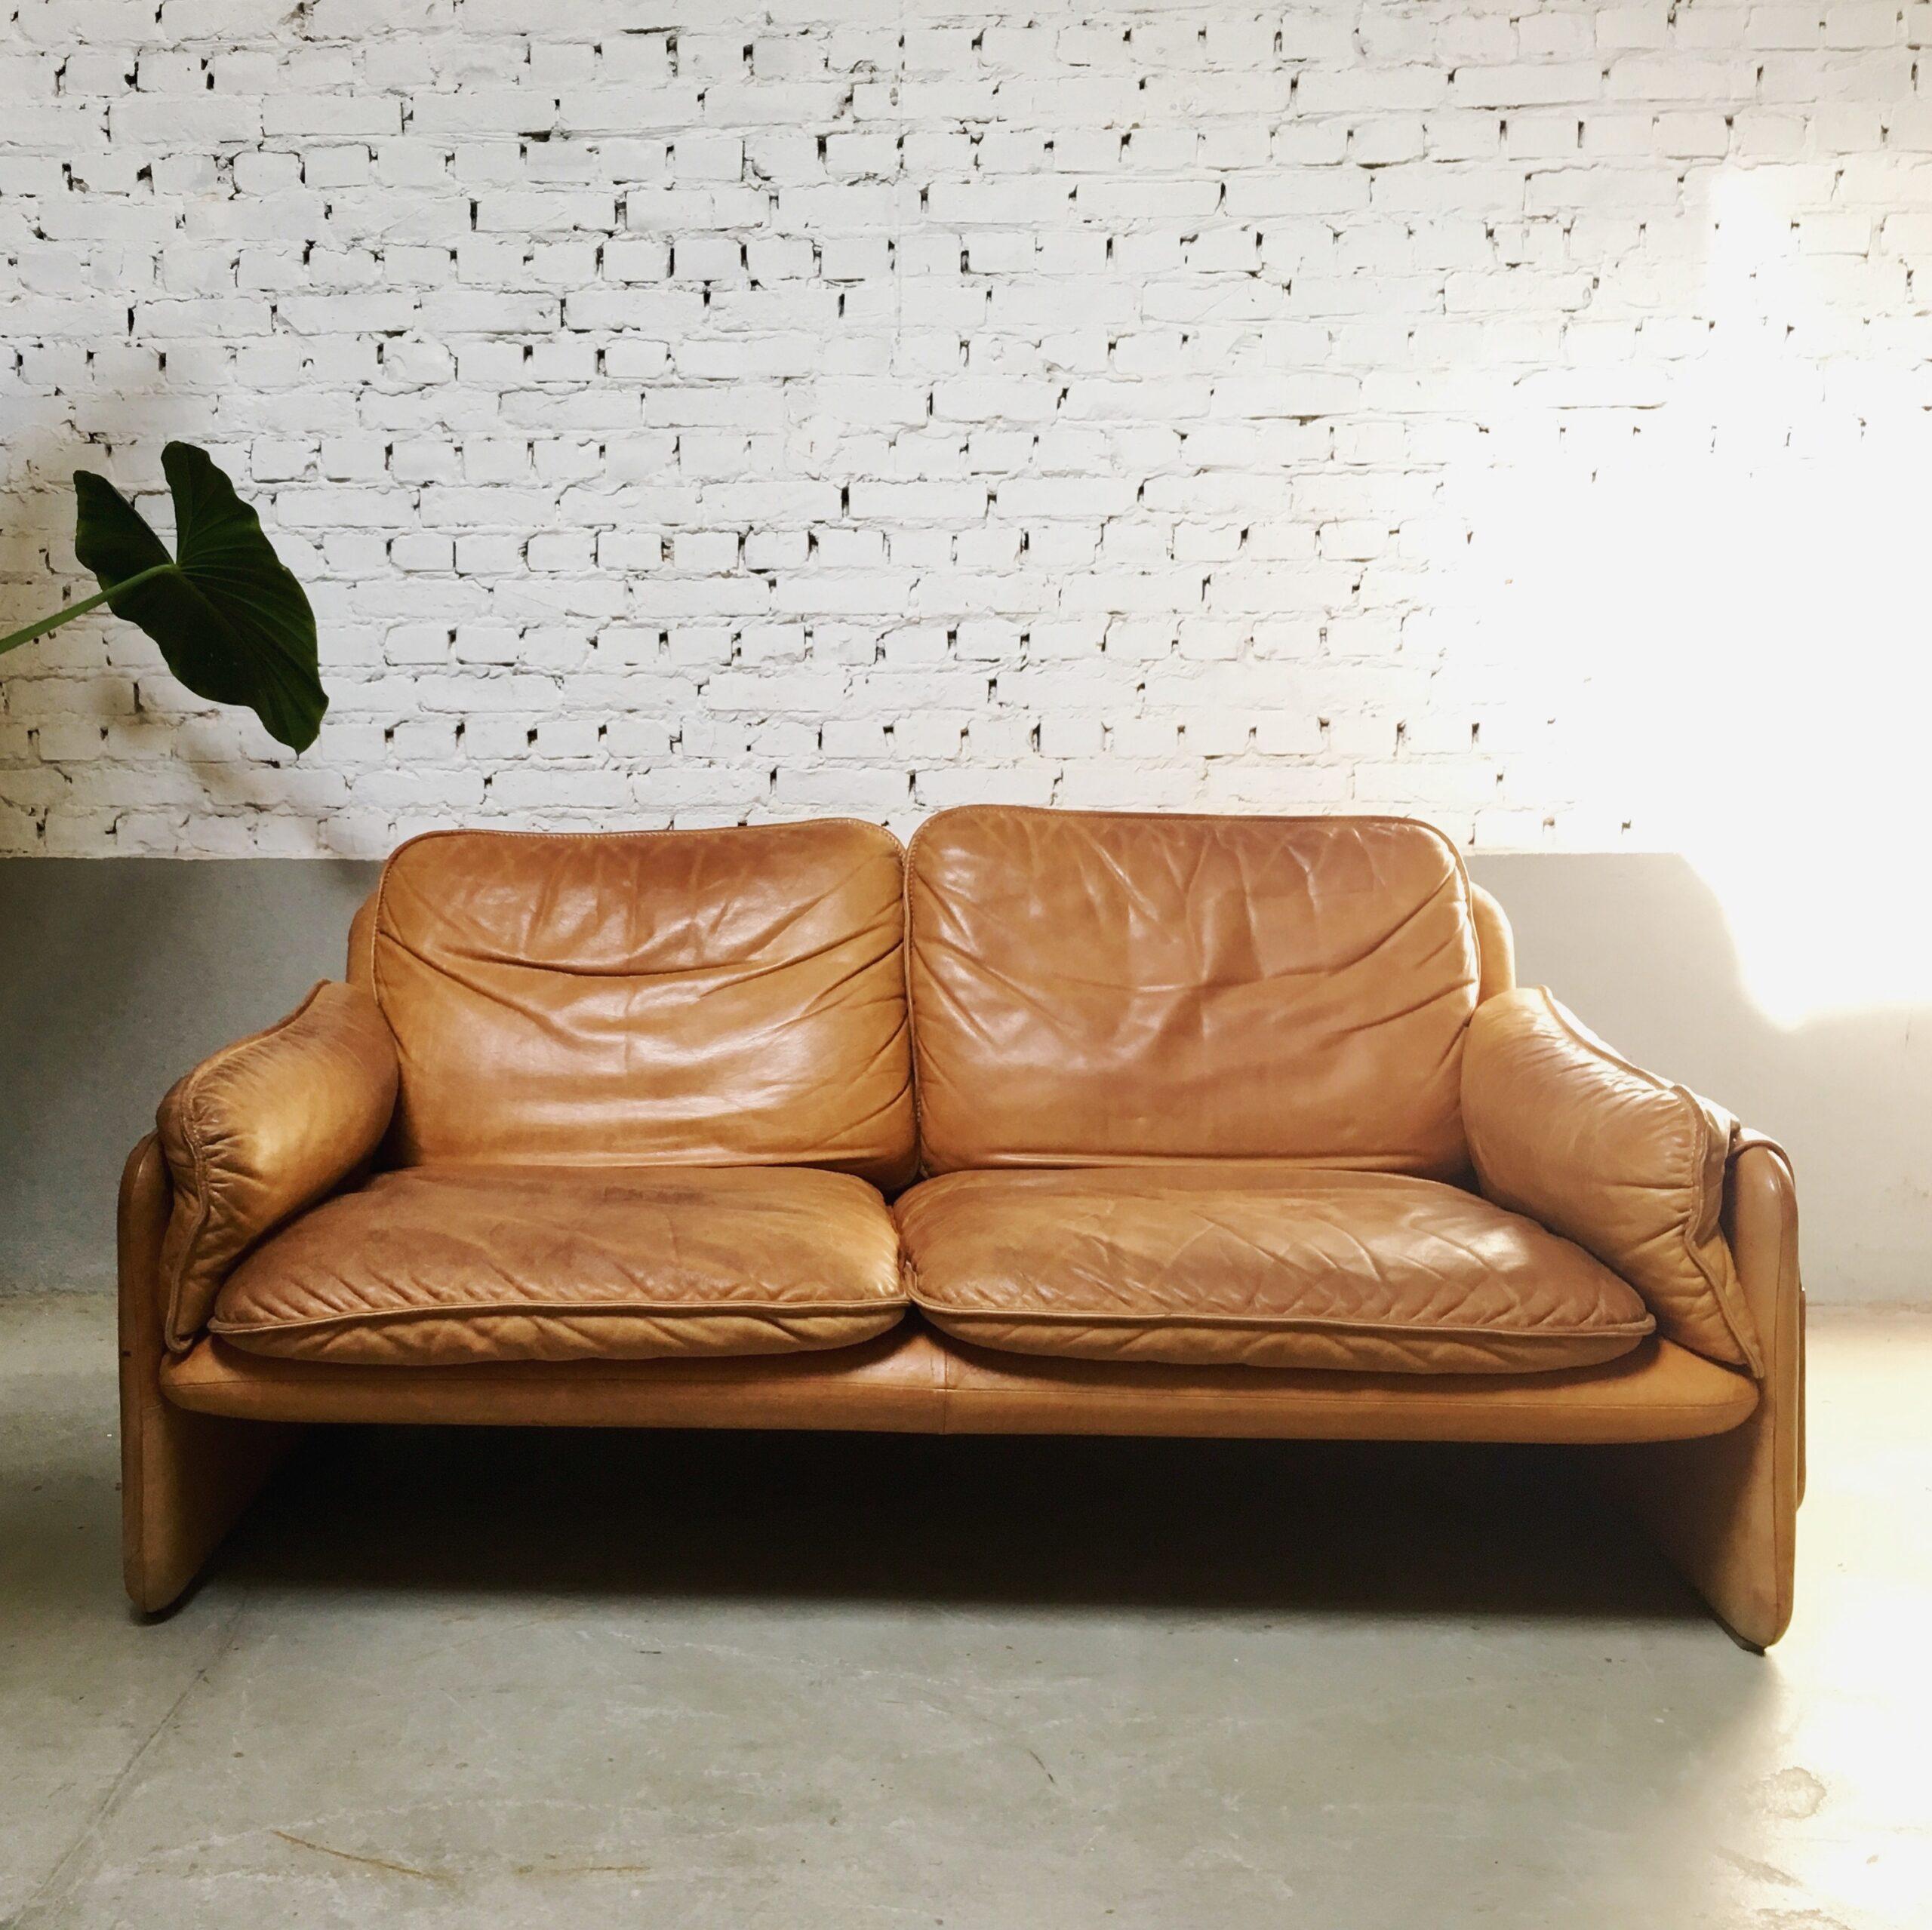 Full Size of De Sede Ds 61 Twoseater Sofa In Cognac Leather 115999 Cassina Auf Raten Copperfield Zweisitzer Machalke Chesterfield Gebraucht Modulares Beziehen Liege Sofa Sofa Cognac